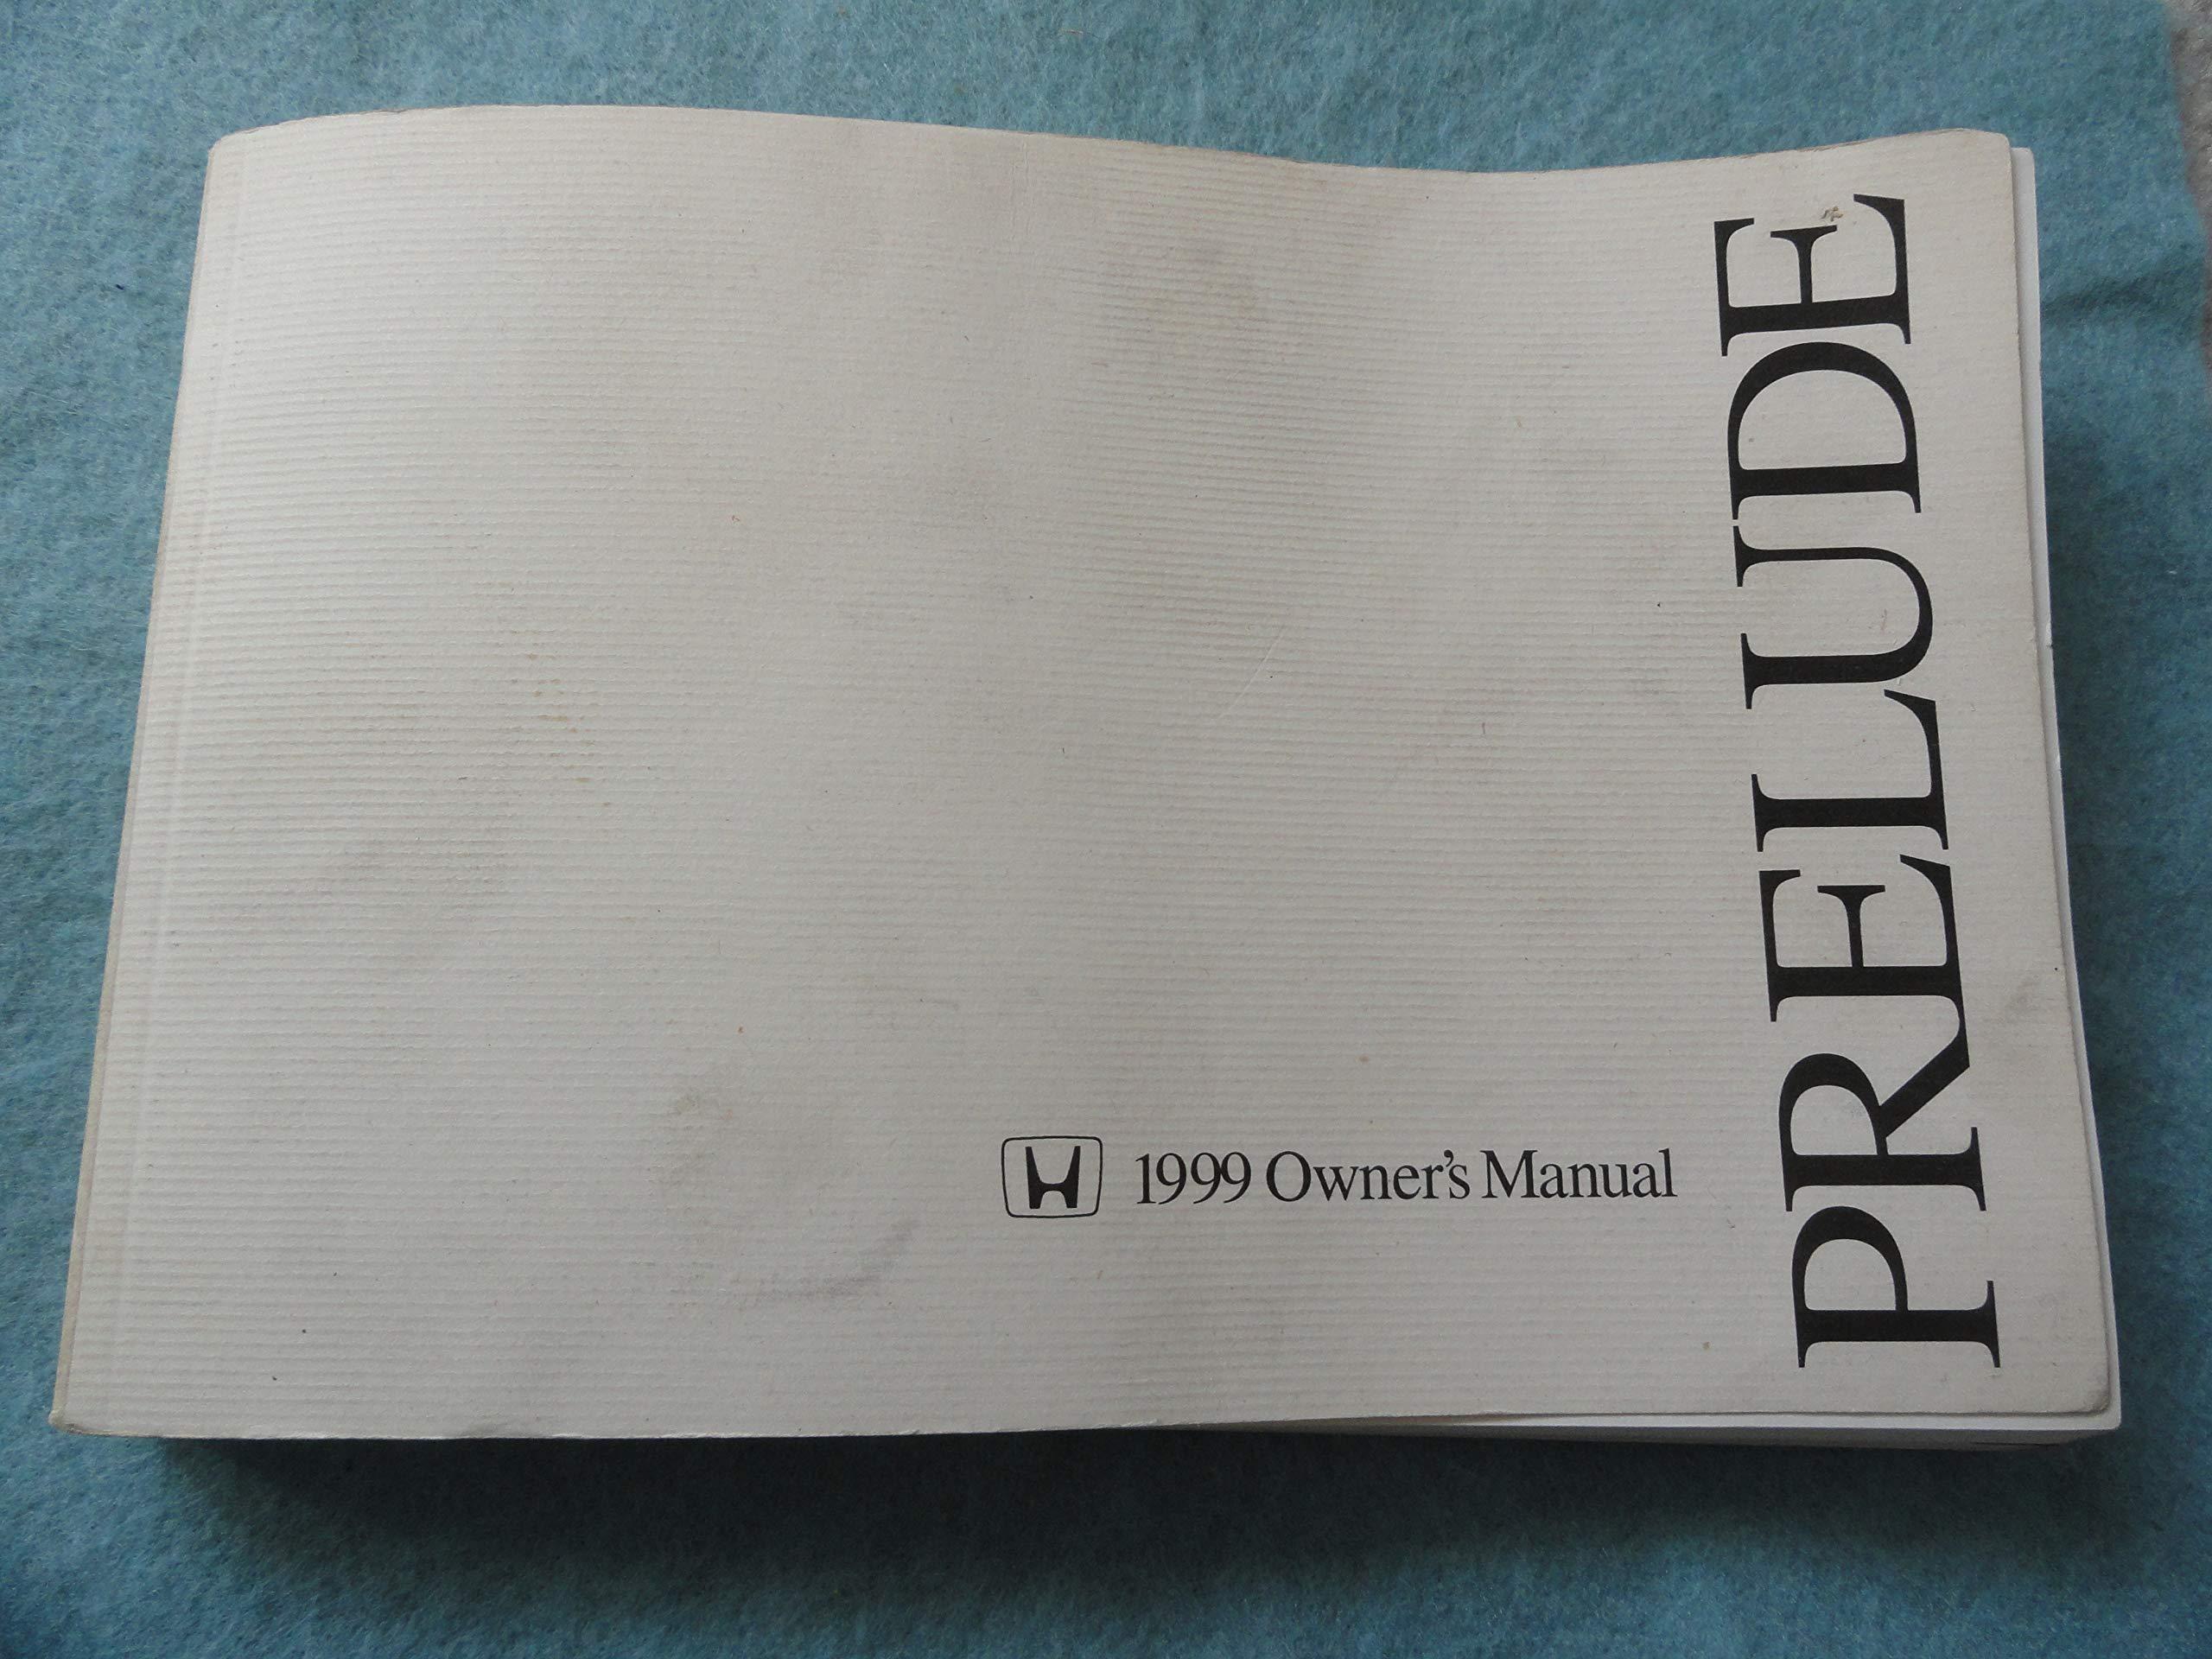 Original 1999 Honda Prelude Owners Manual - 280 Pages: Honda: Amazon.com:  Books